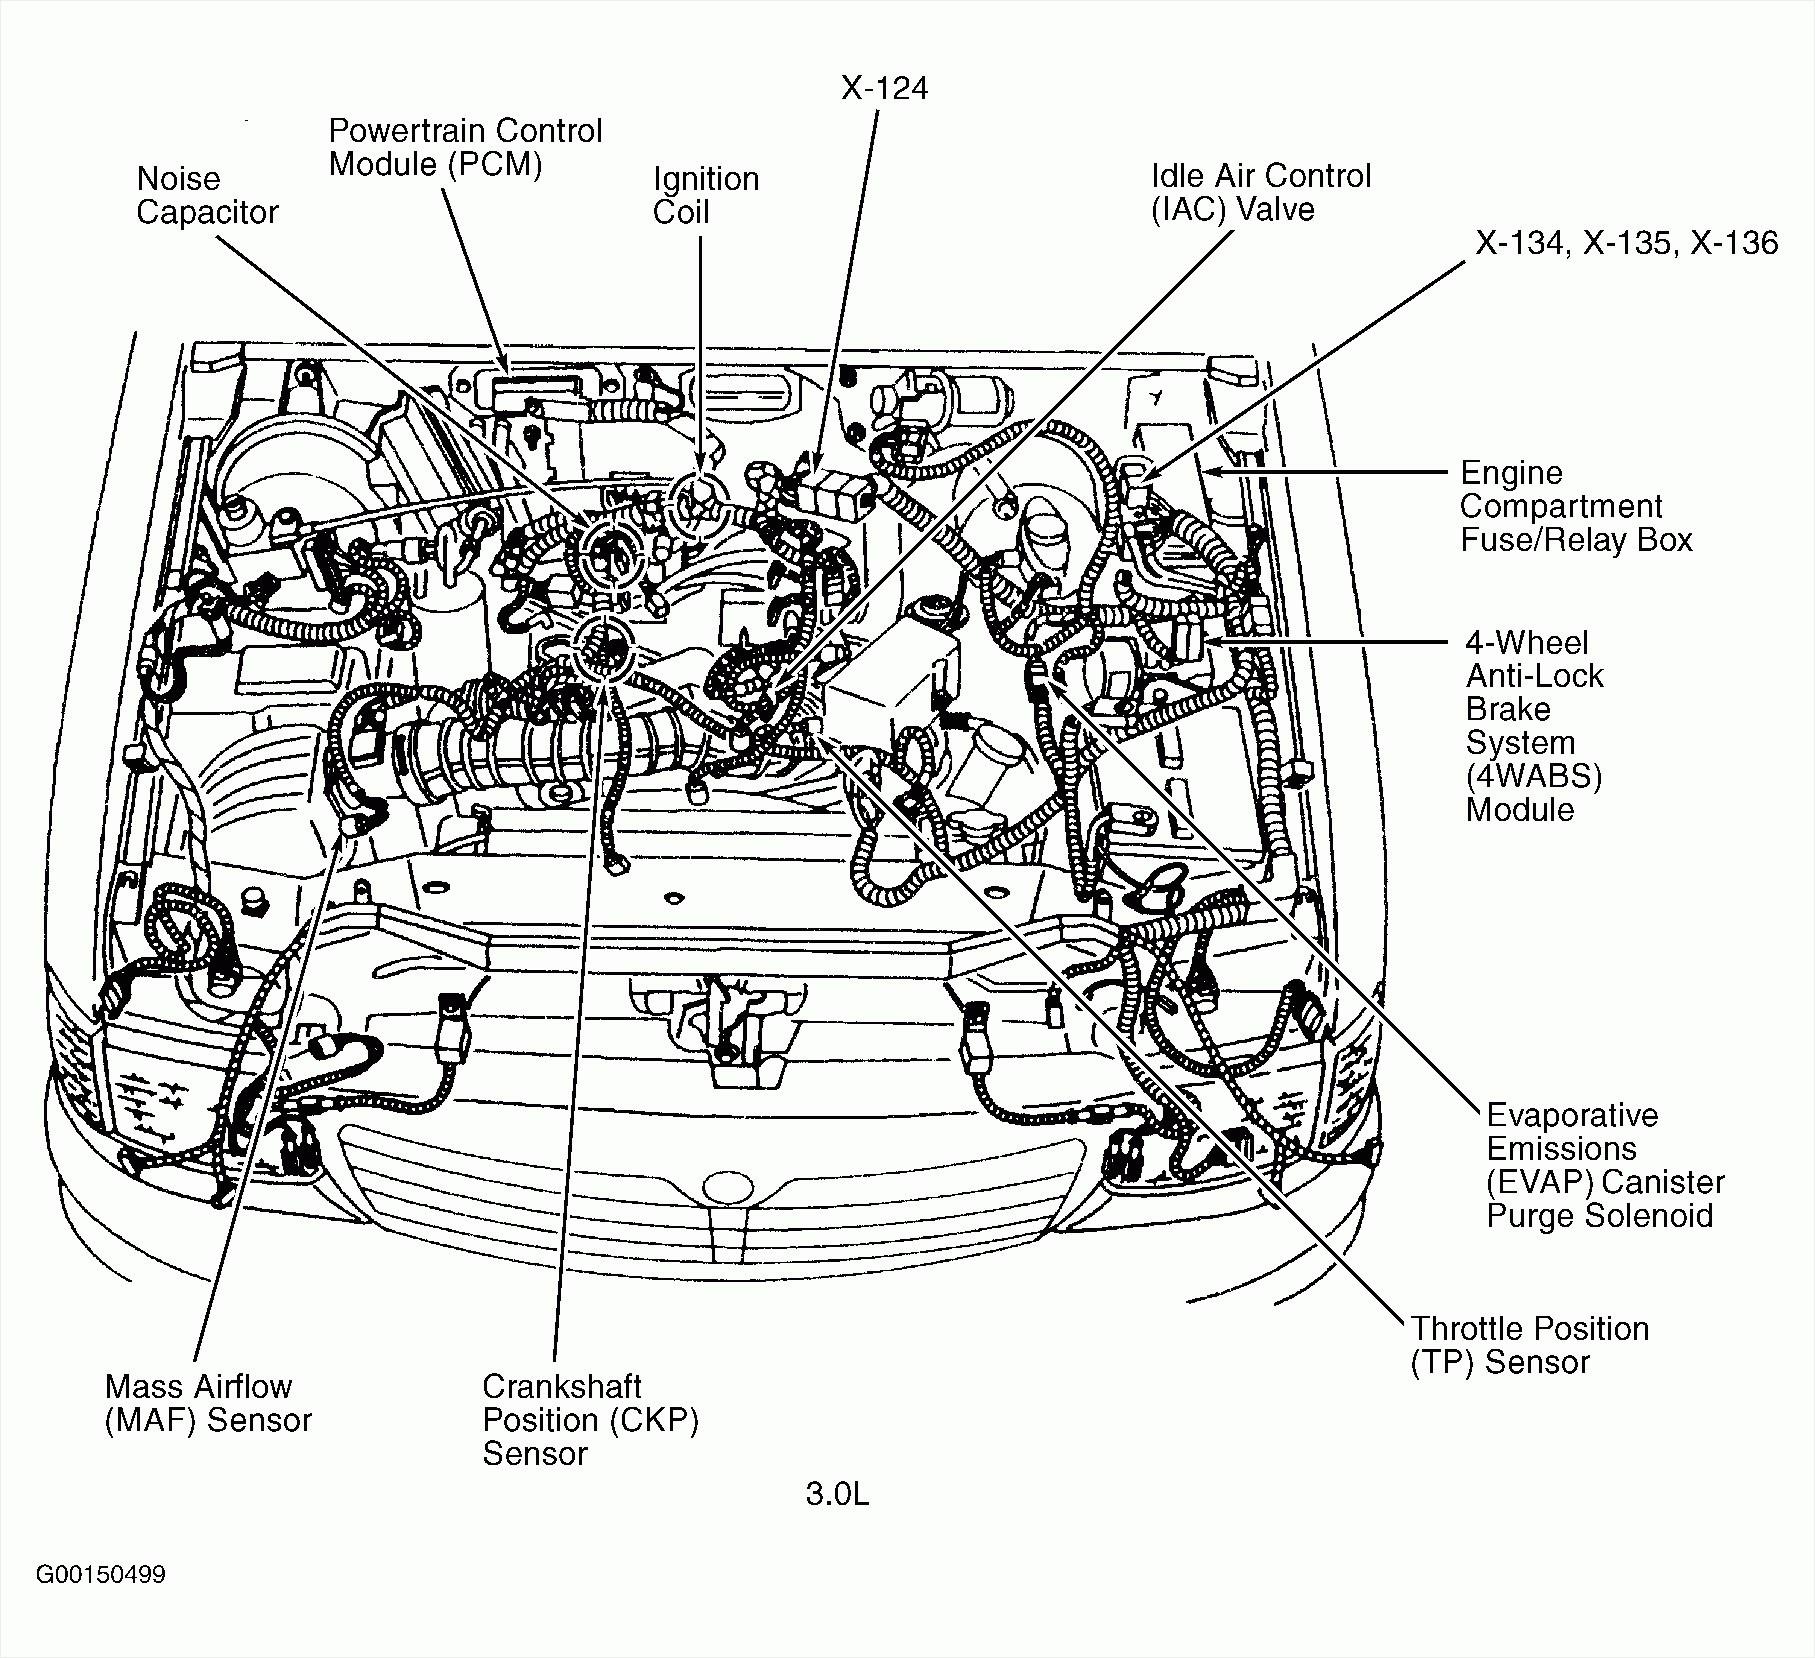 2000 mazda mpv engine diagram bottom view - auto wiring diagrams  aberre.it